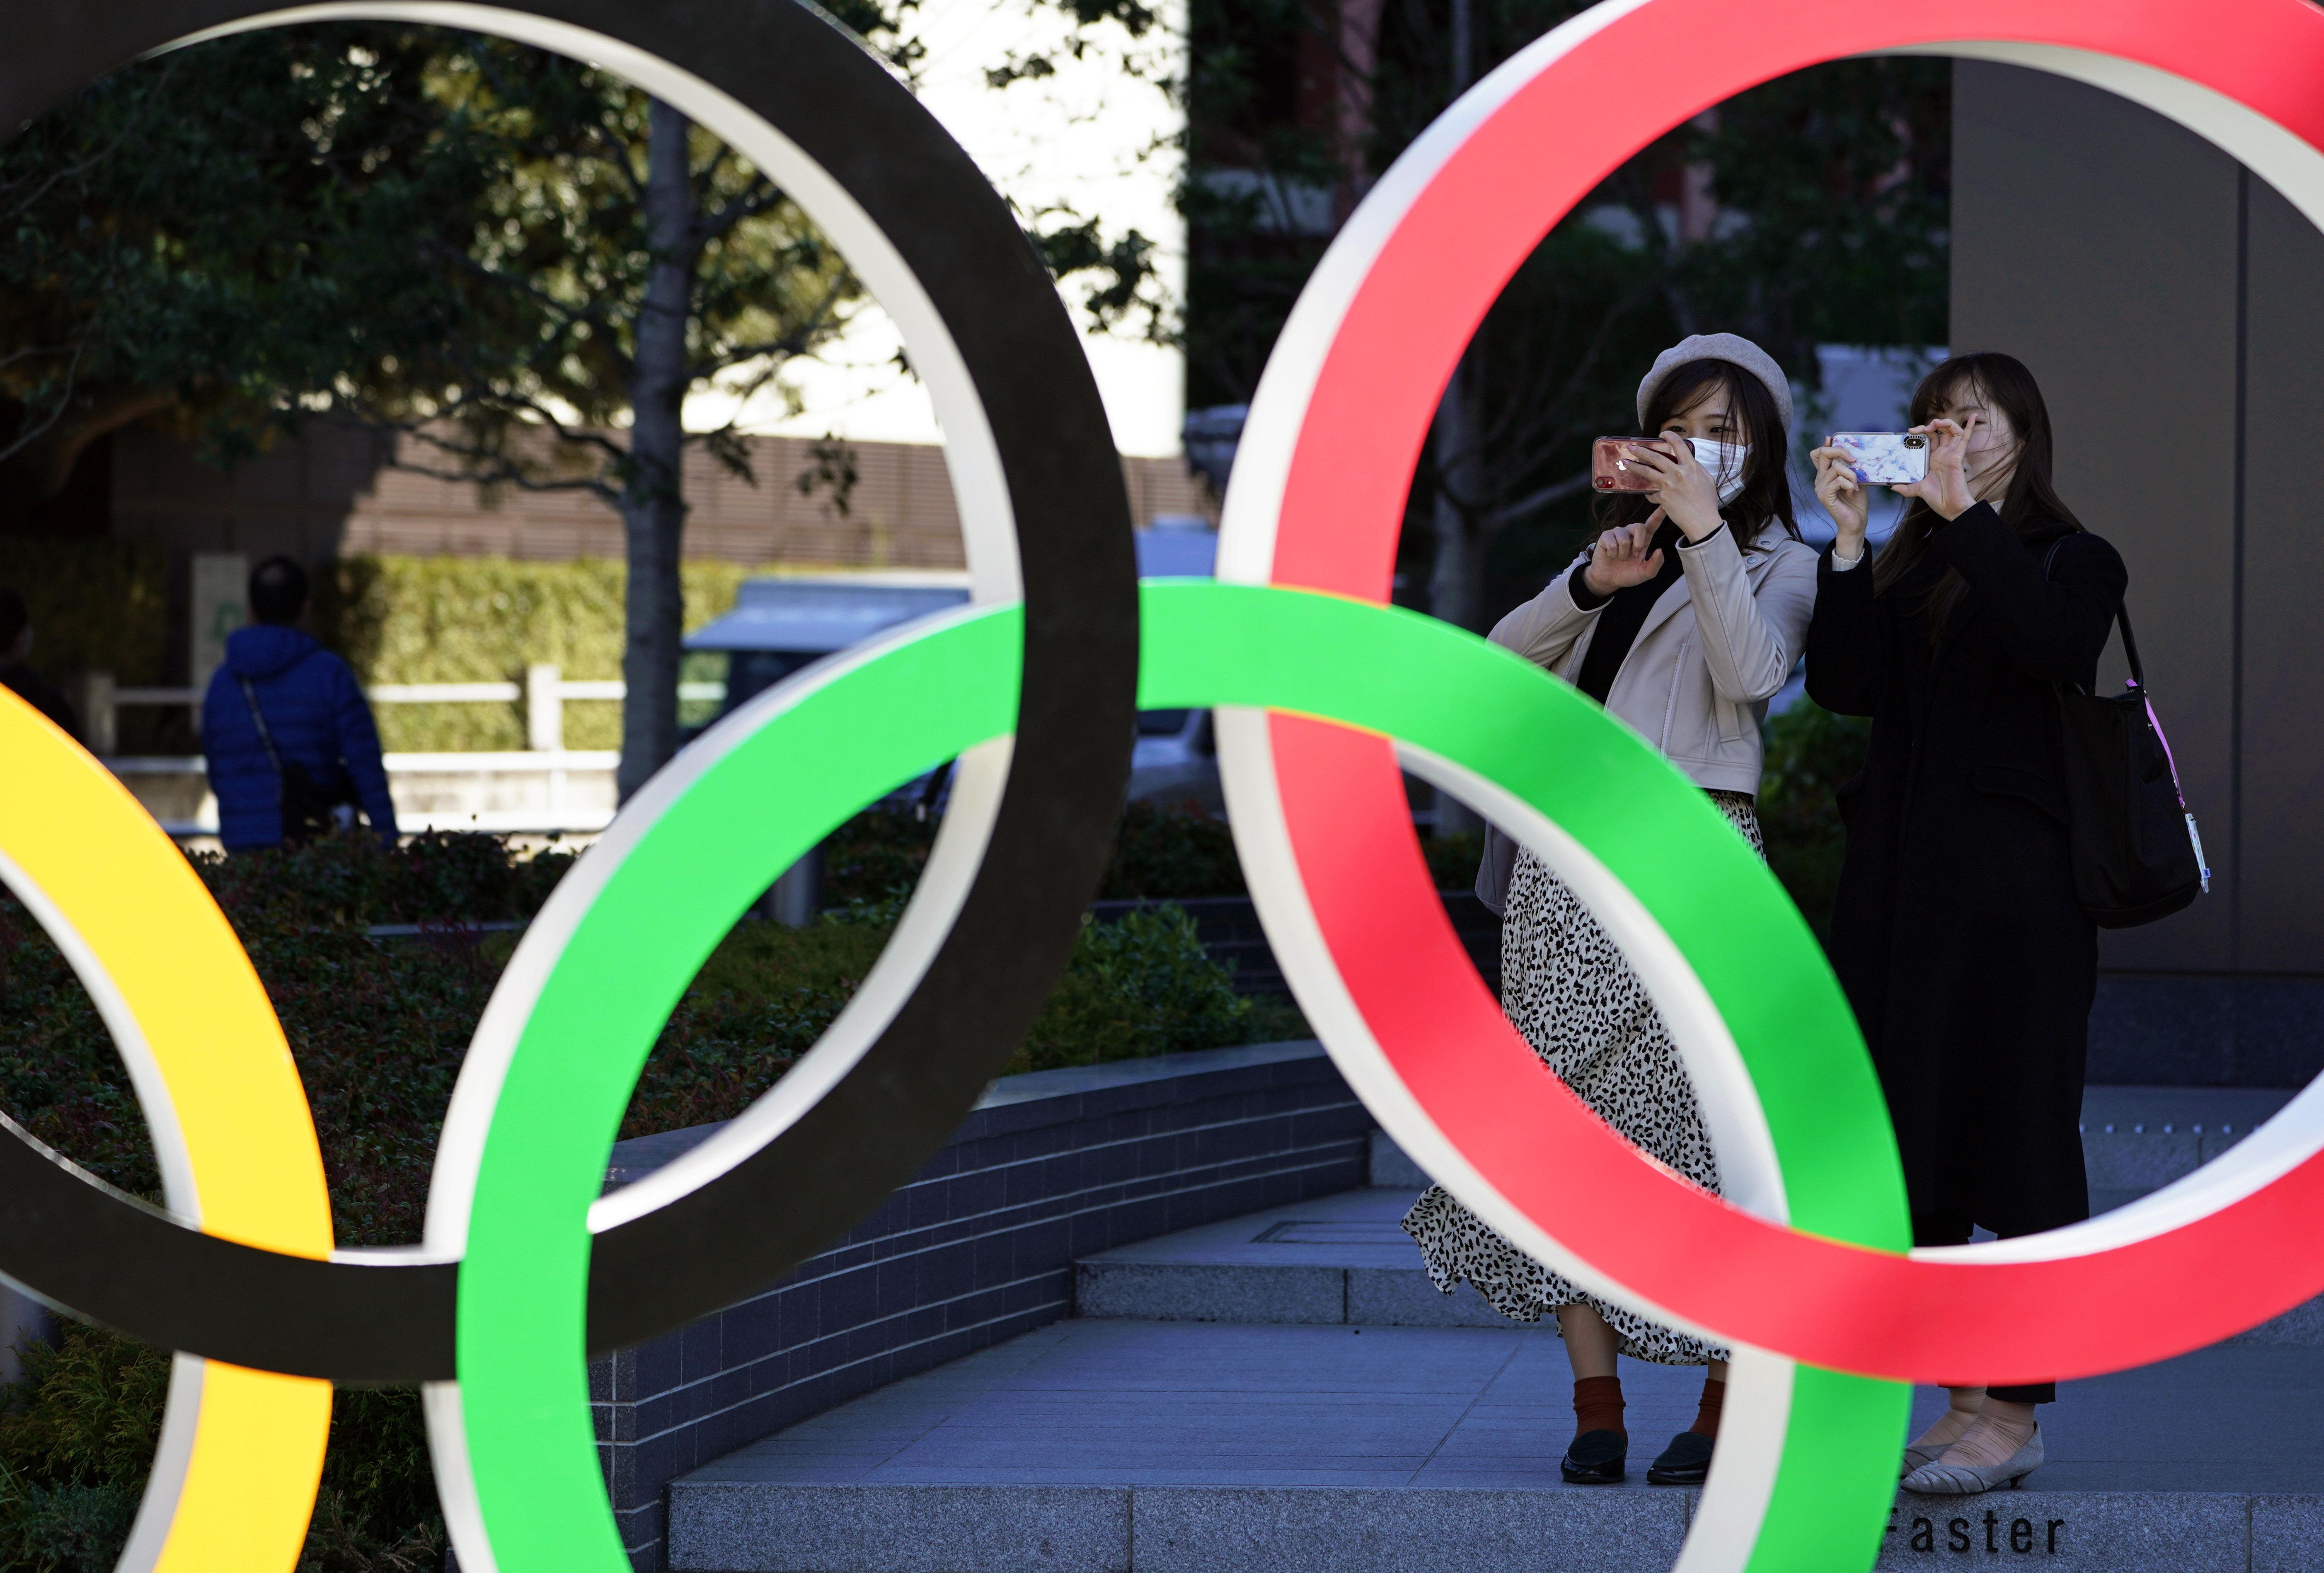 Olympia Verschiebung: Regierung begrüßt Entscheidung, Sportler sind enttäuscht, aber verständnisvoll